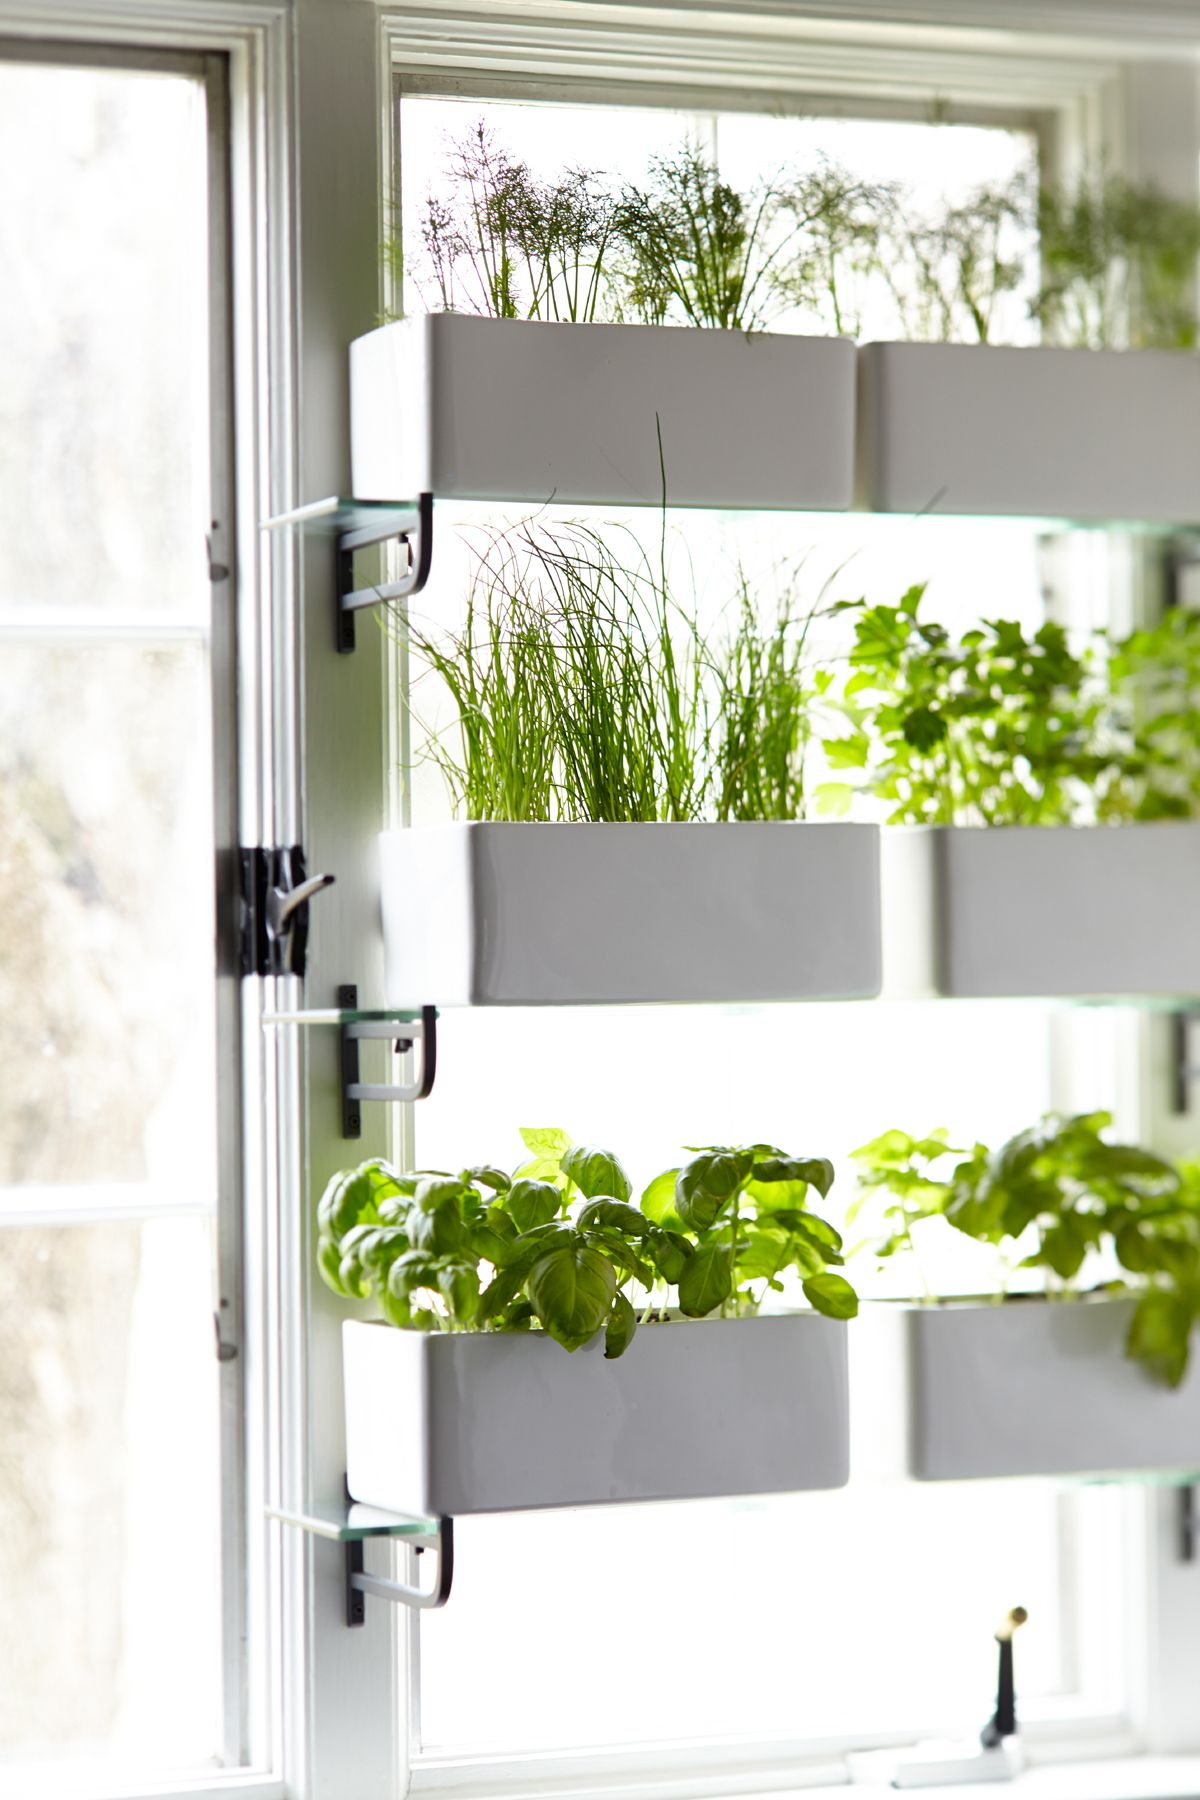 Kitchen Greenhouse Window White Quartz Countertops Privacy Garden Using Ikea Glass Shelves